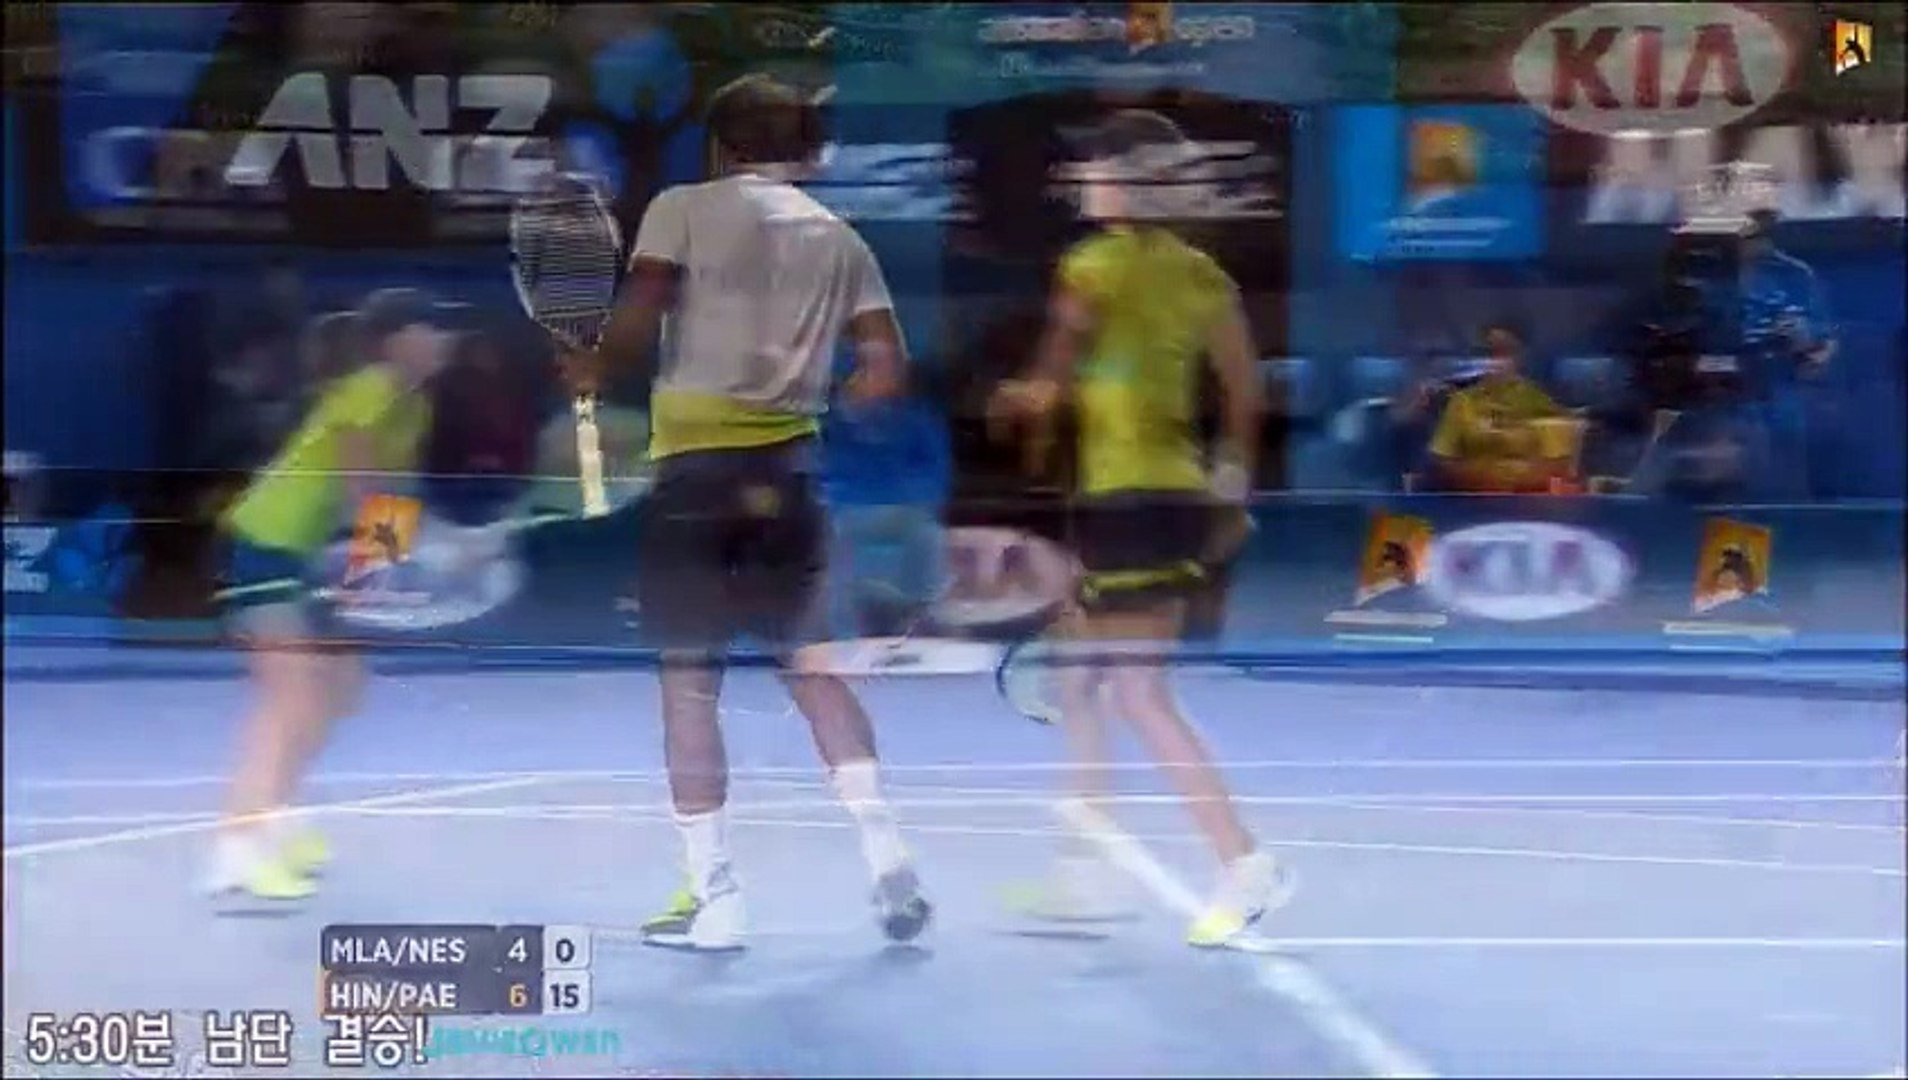 Hingis/Paes vs Mladenovic/Nestor 2015 AO Highlights